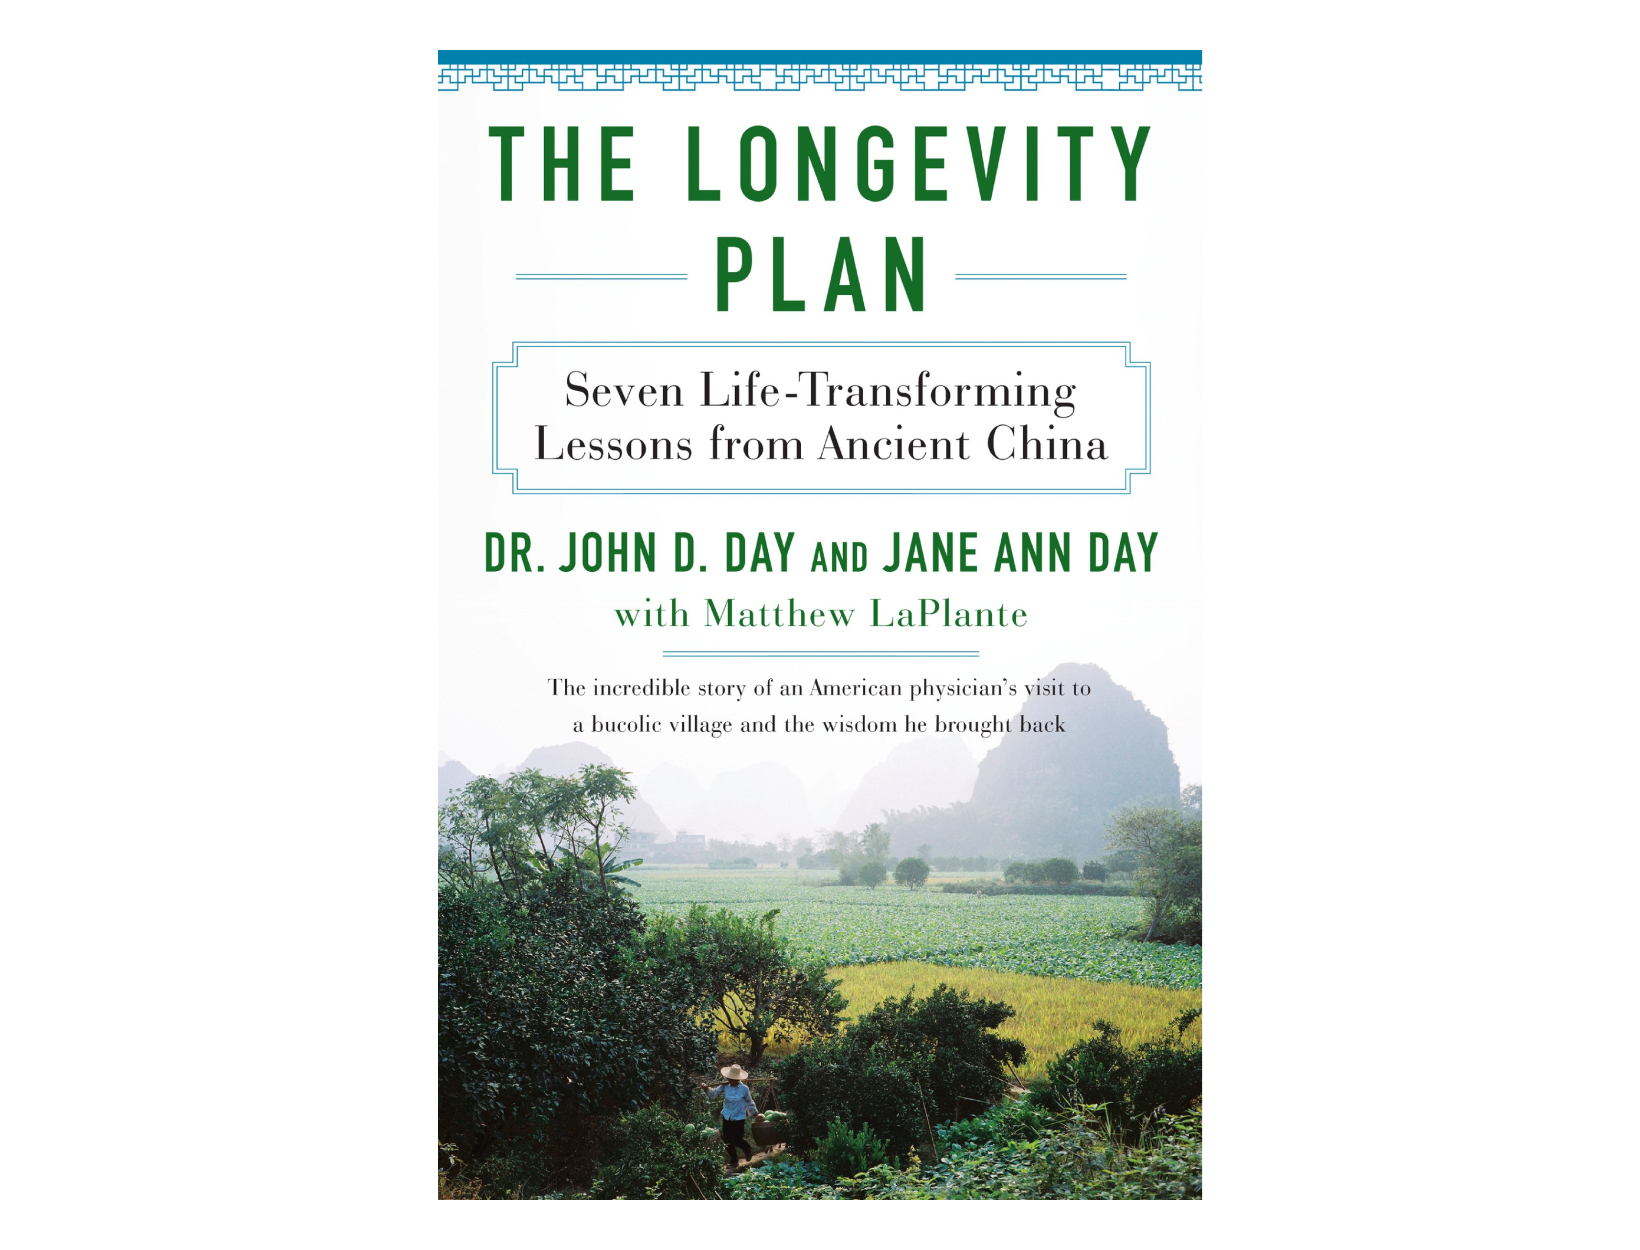 <em>The Longevity Plan</em> by John D. Day, MD, and Jane Ann Day